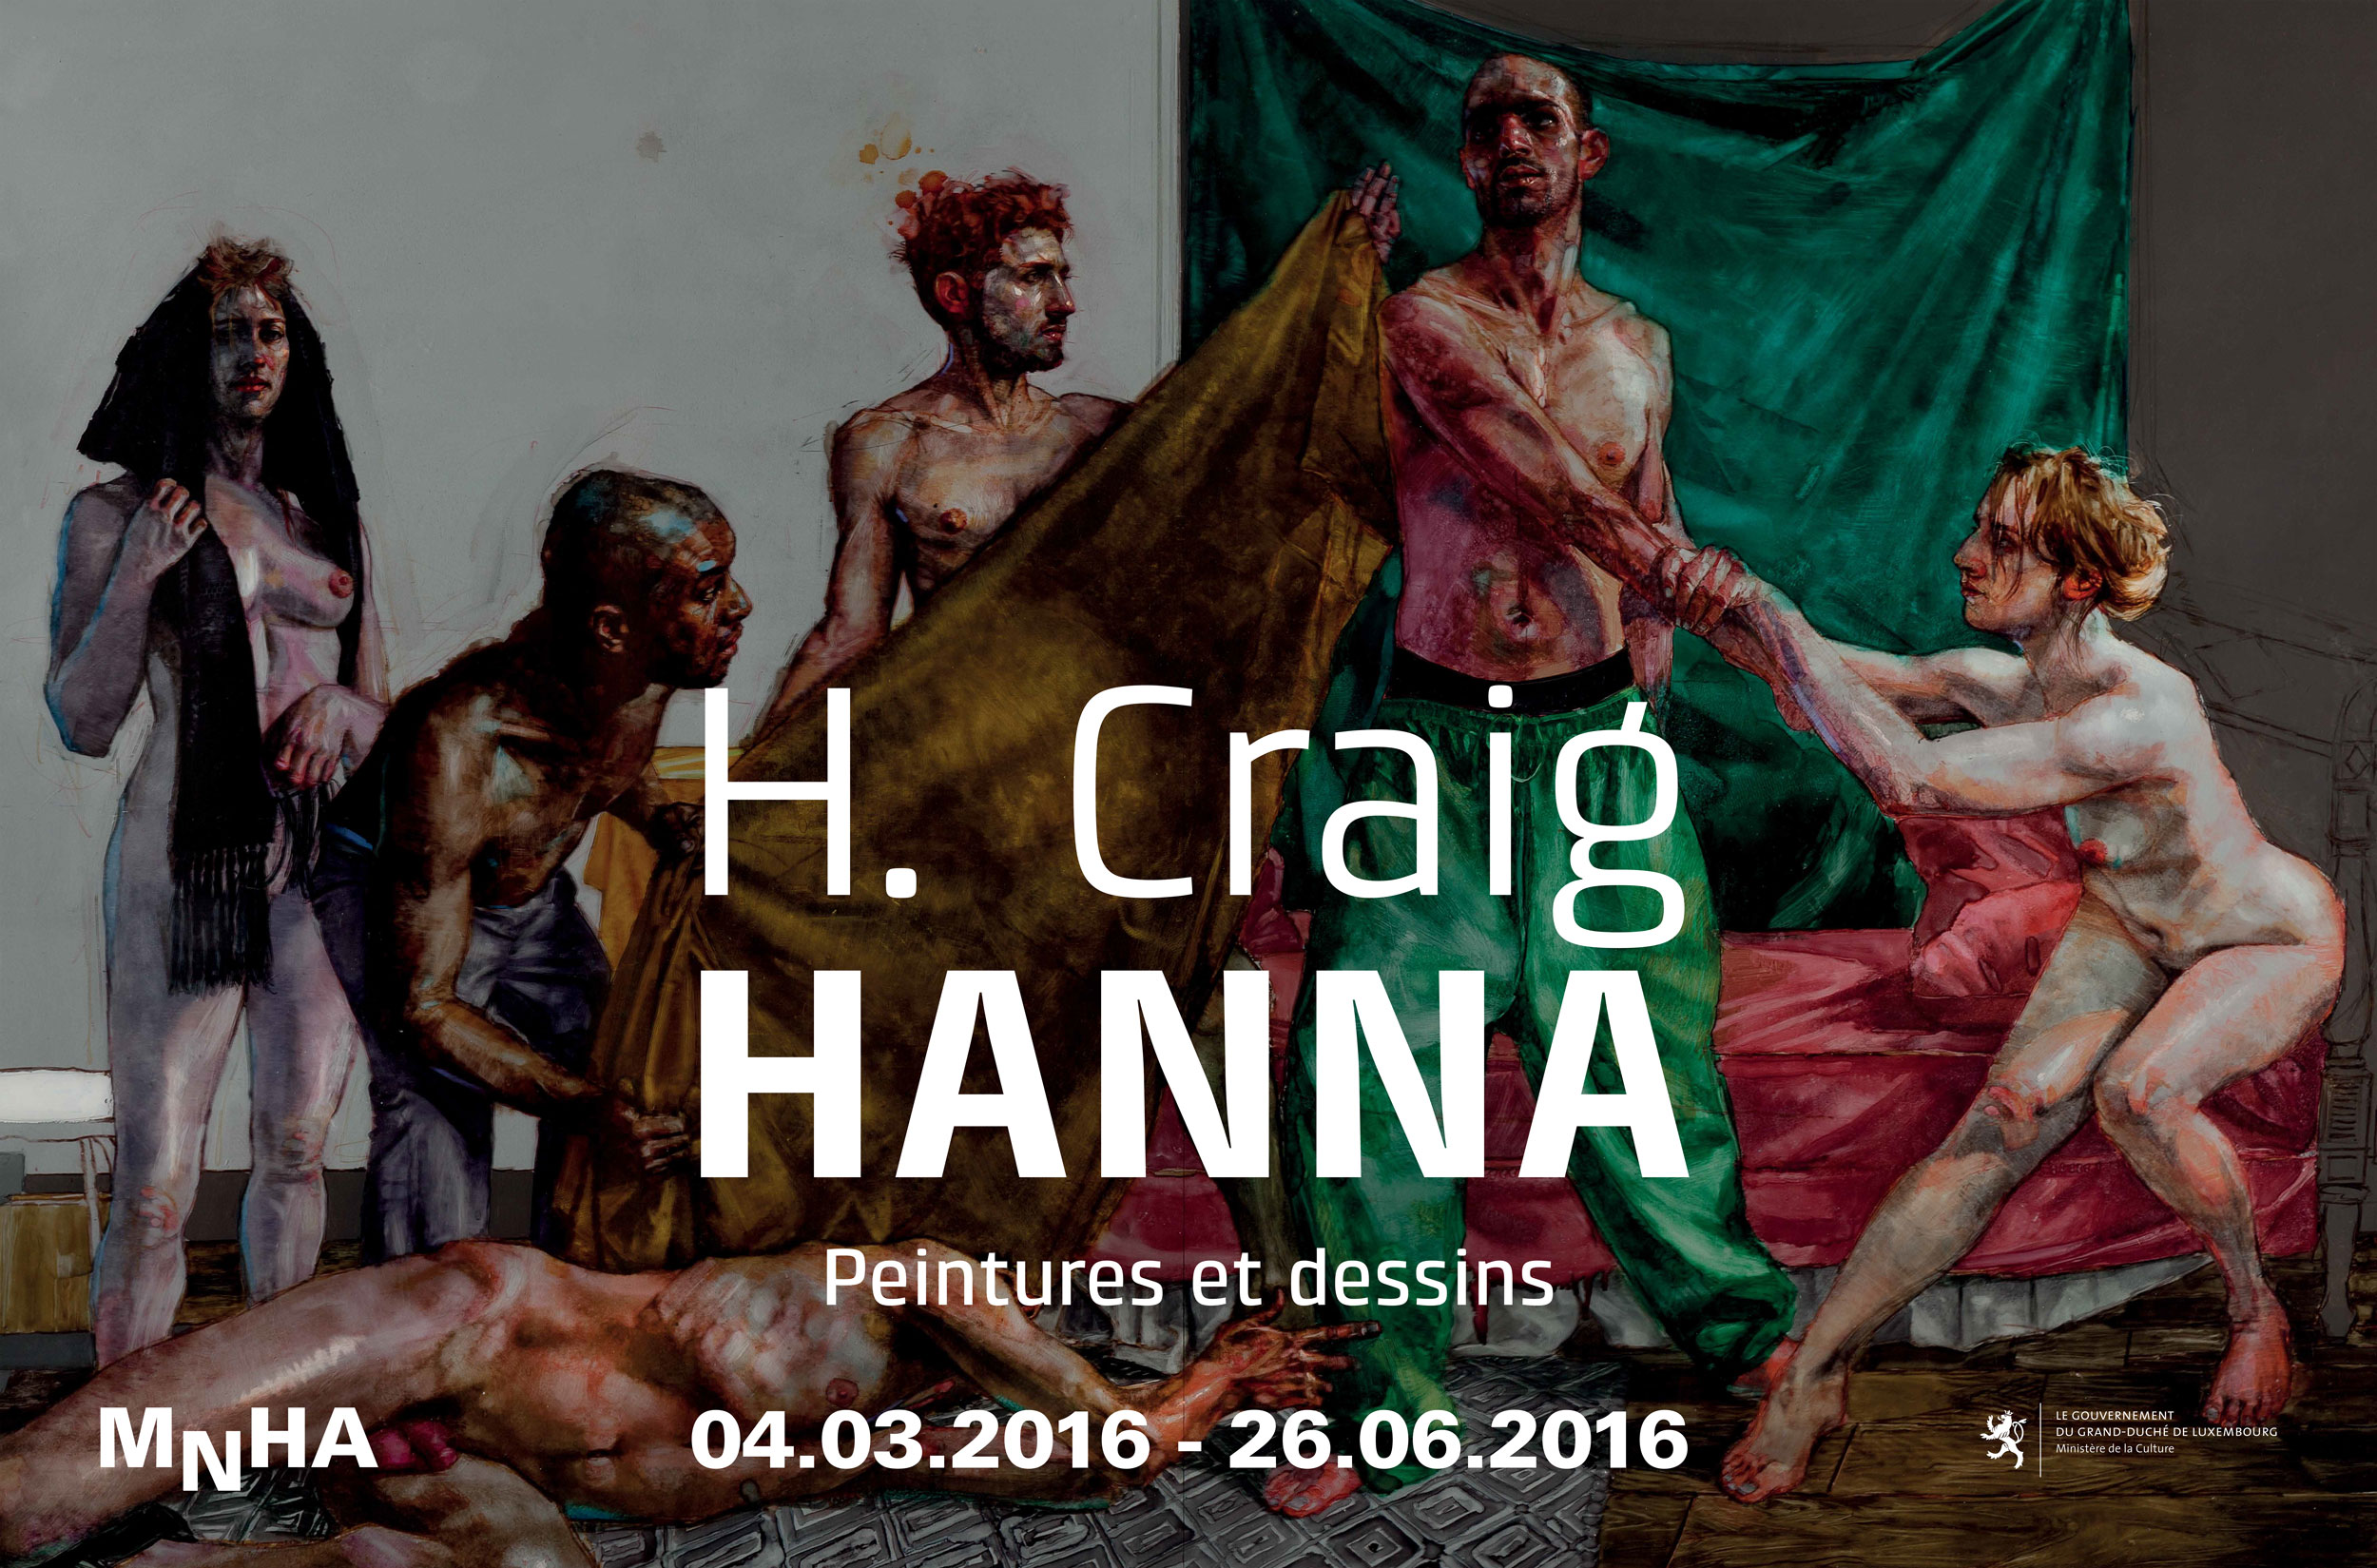 H-Craig-Hanna-MNHA.jpg